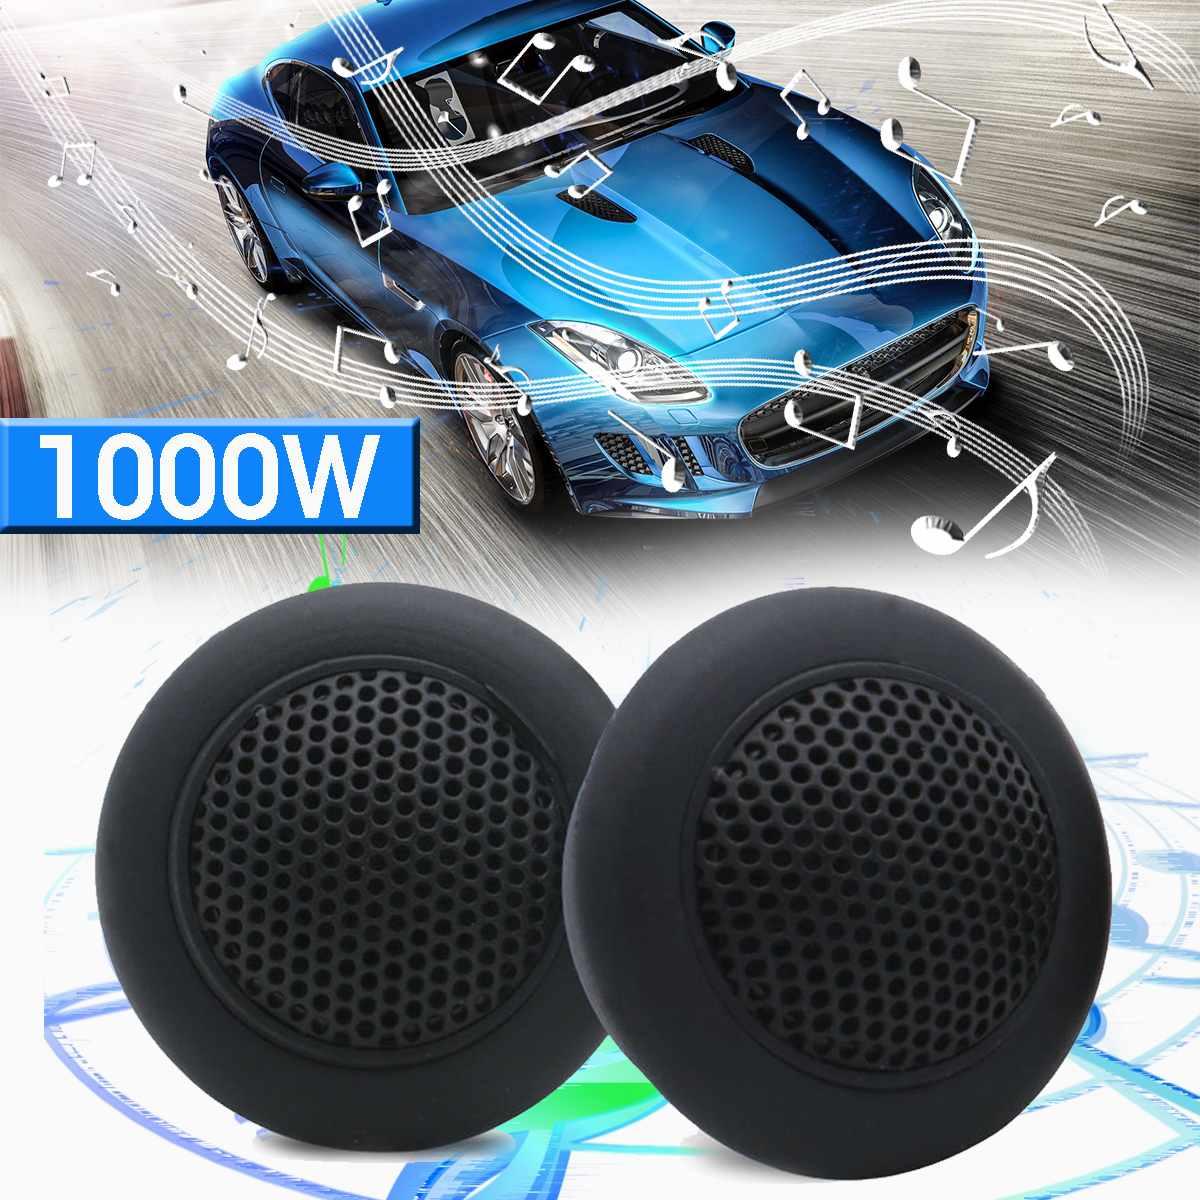 2pcs Micro Dome Tweeters 89db 12V-24V 1000W Car Audio Music Speakers Automobile Horn Loudspeaker Stereo Treble Tweeters Speaker(China)